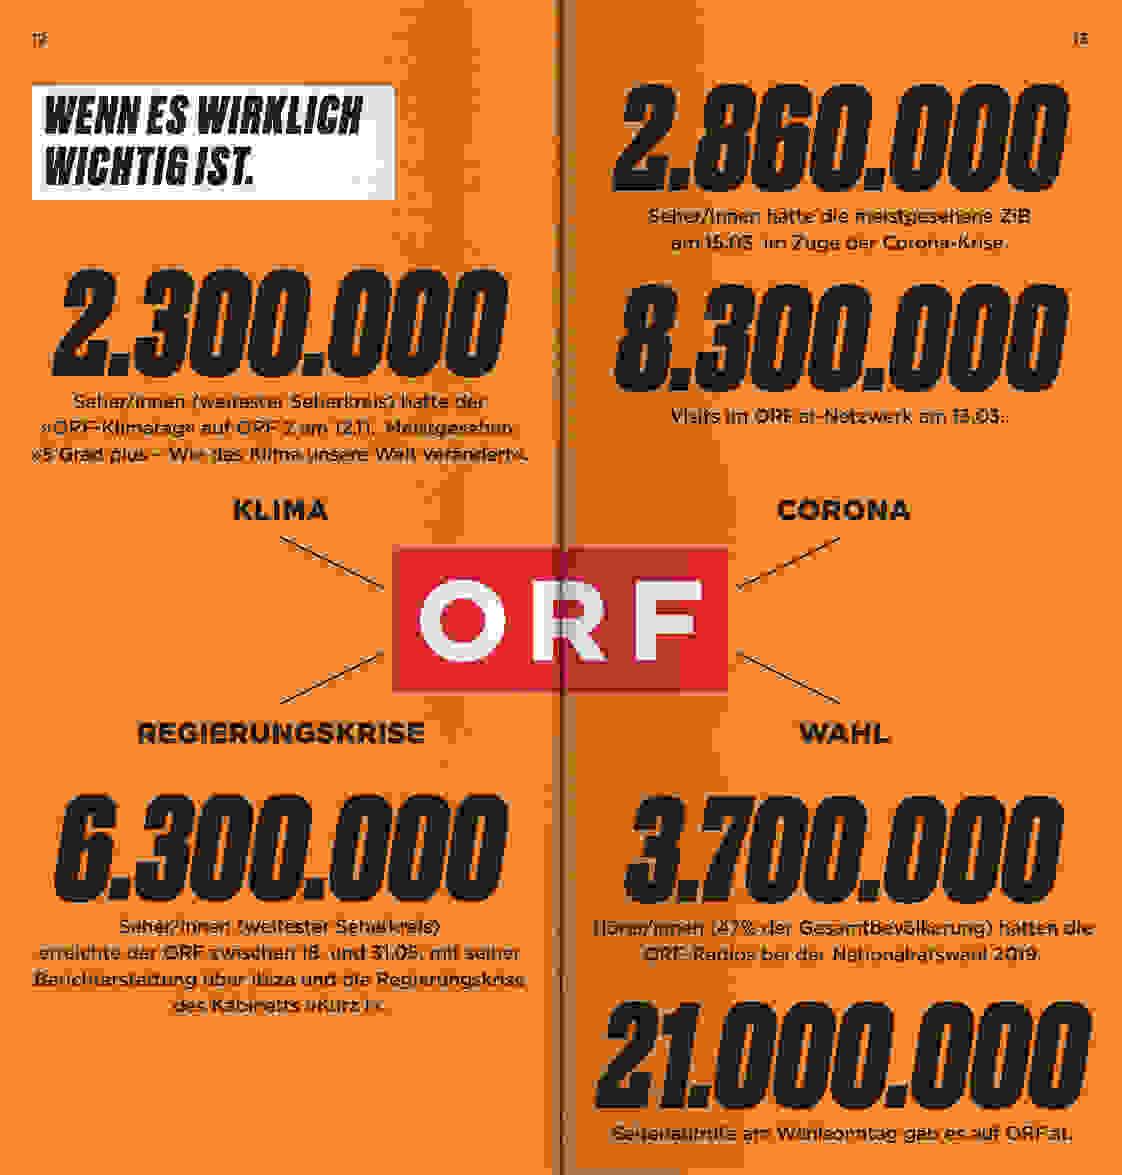 ORF PV 2020 Slider Doppelseite Information 3